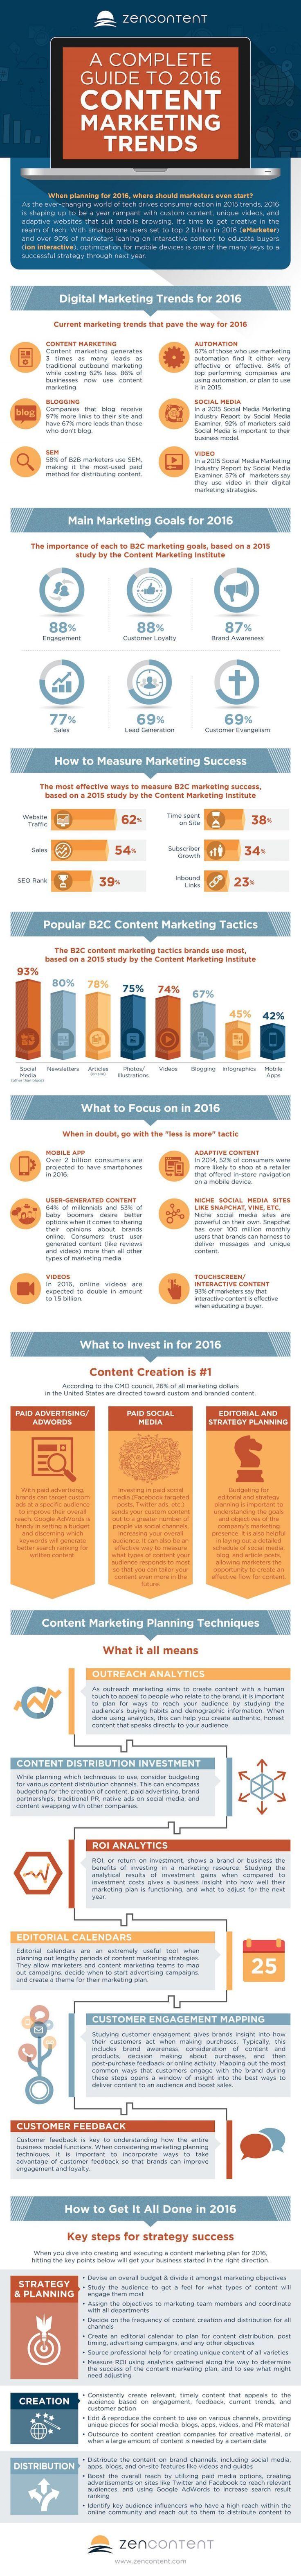 Guía de tendencias de Marketing de Contenidos en 2016 [Infografía] #marketing